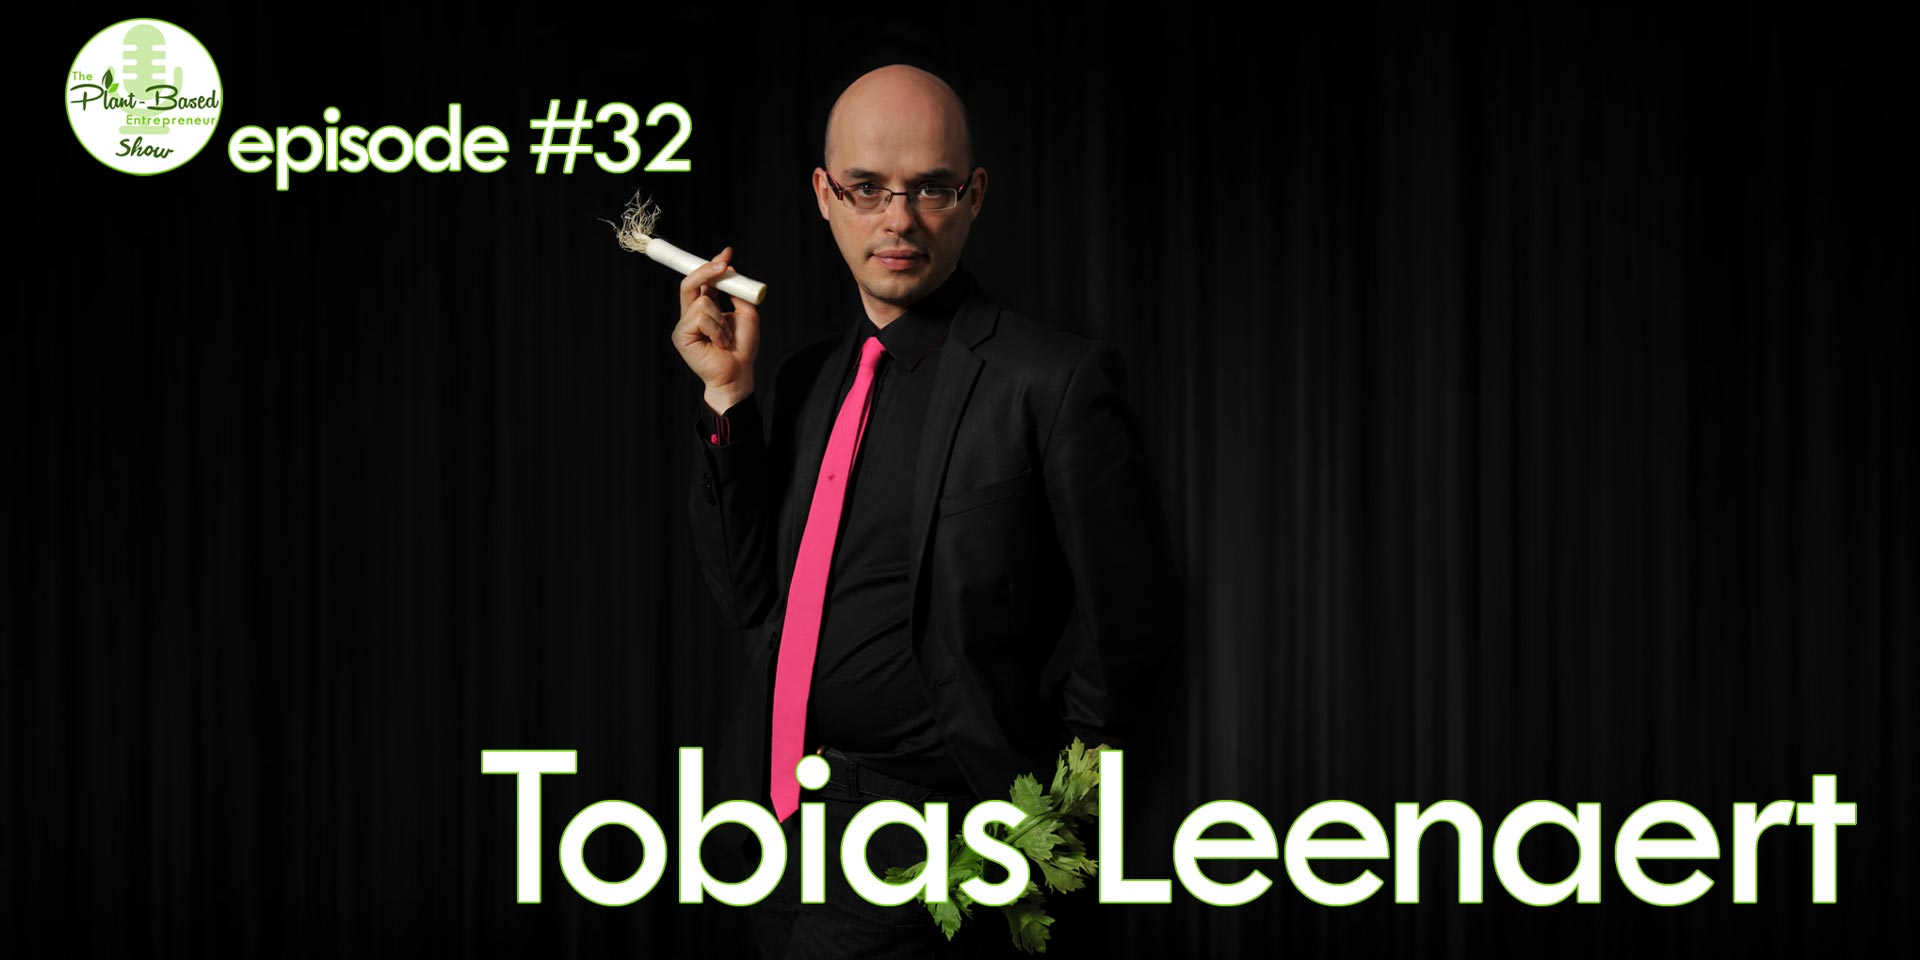 Episode #32 - Tobias Leenaert